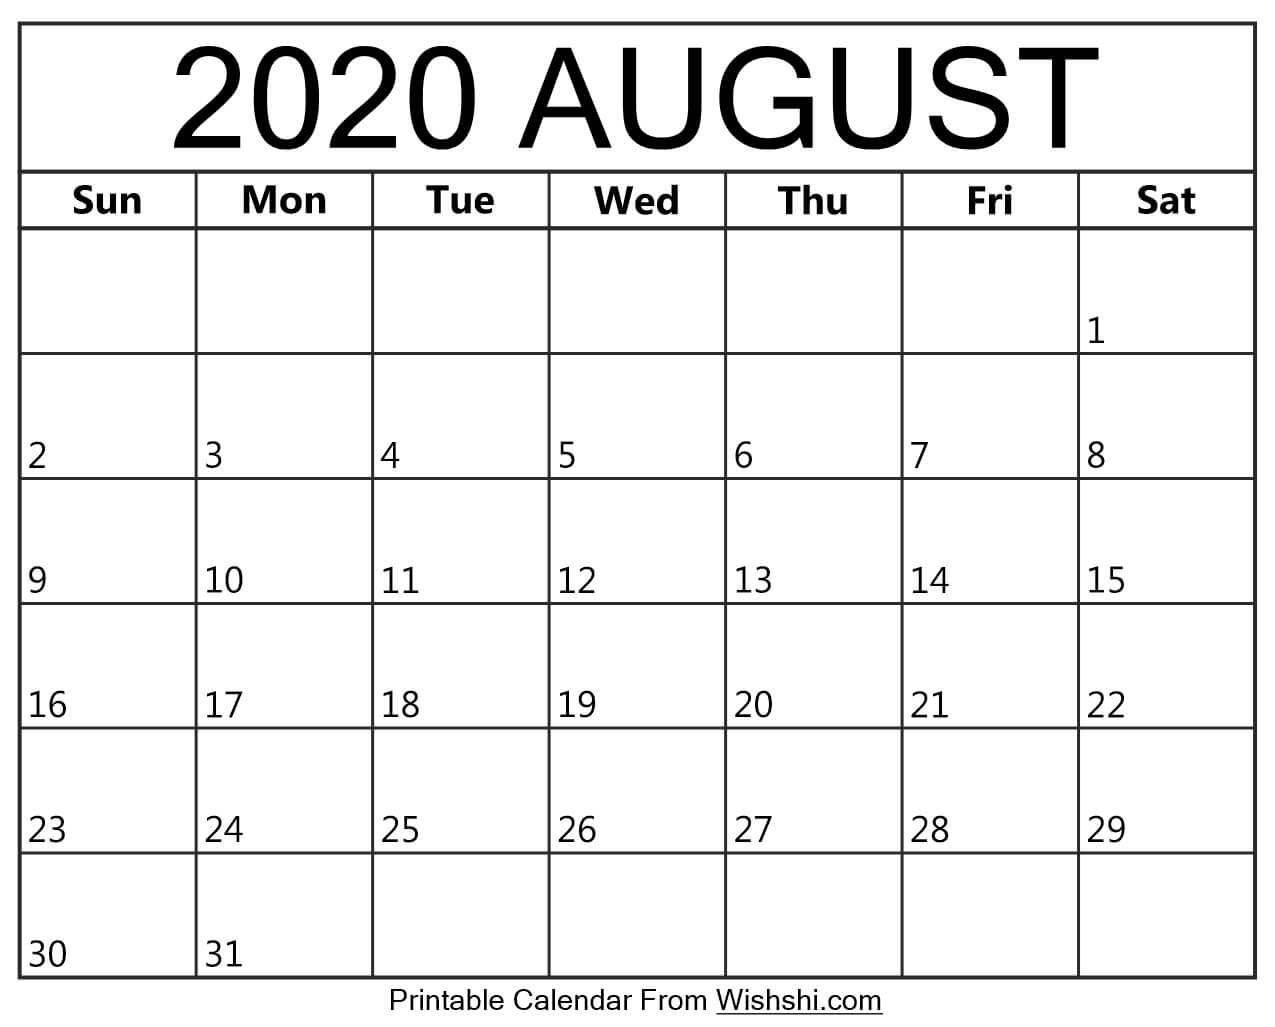 August 2020 Calendar Printable - Free Printable Calendars